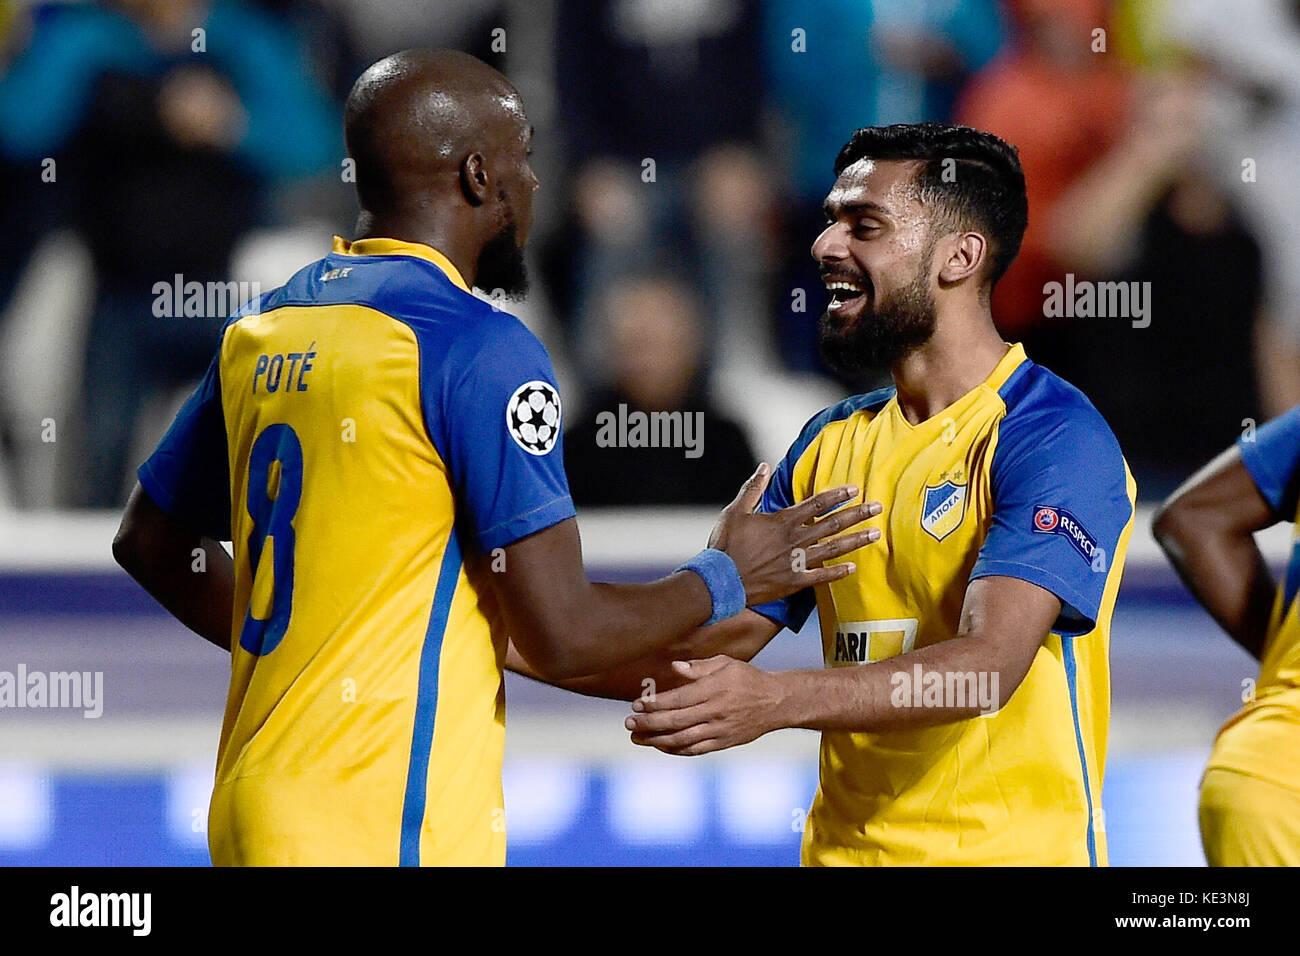 Nicosia, Cyprus. 17th Oct, 2017. Nicosia's Mickael Pote (L) celebrates his 1-0 goal during the Champions League Stock Photo